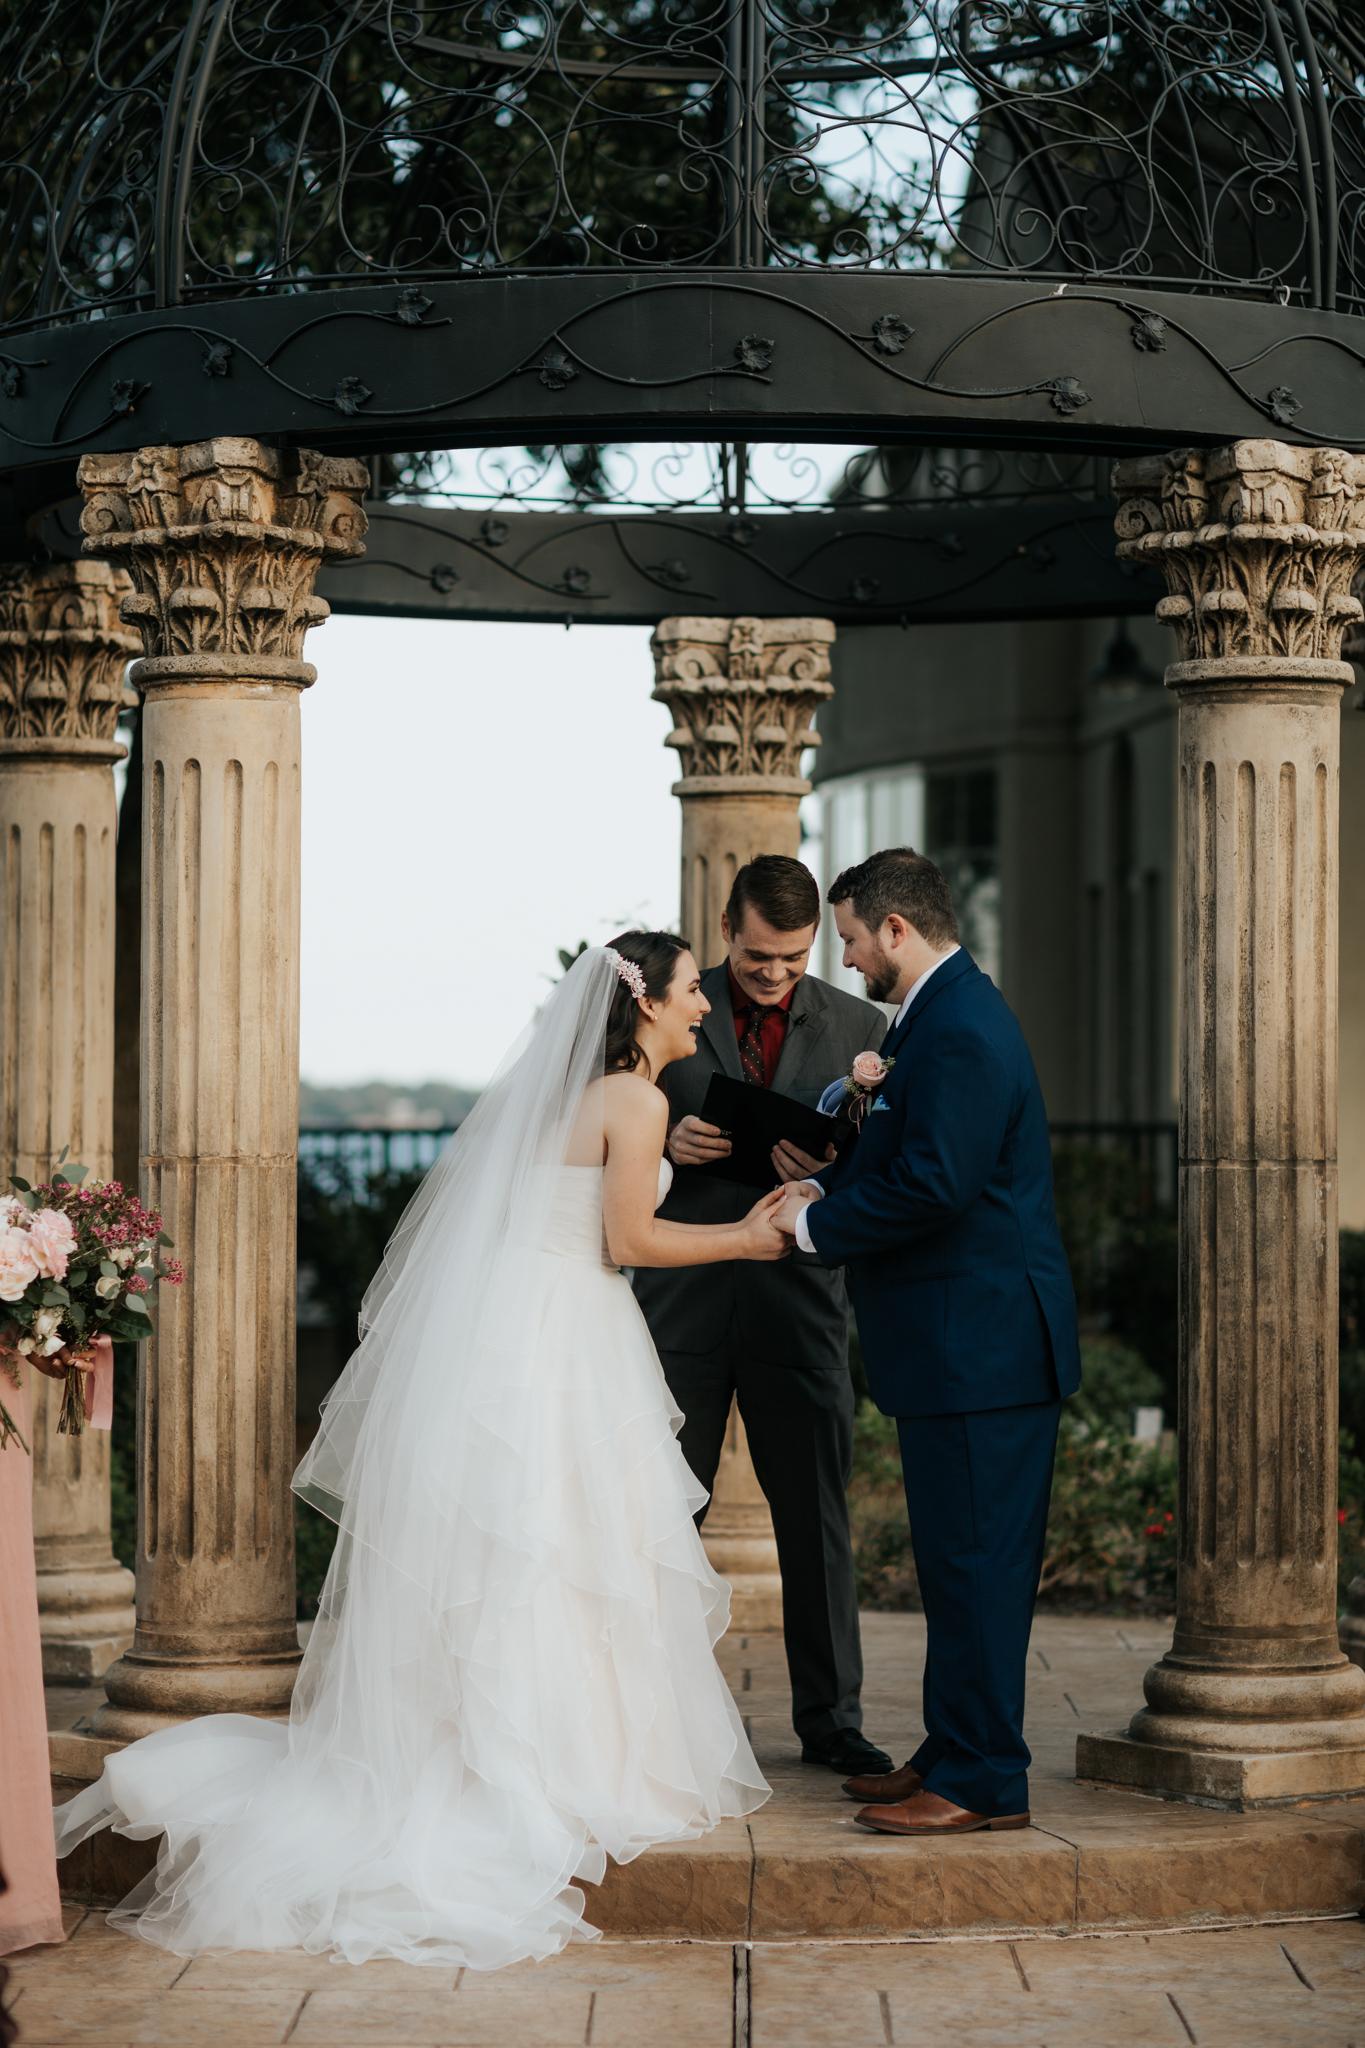 Leah Nicole Photography - Houston Wedding Photographer-Lake Conroe Wedding- Houston Wedding Photographer-32.jpg